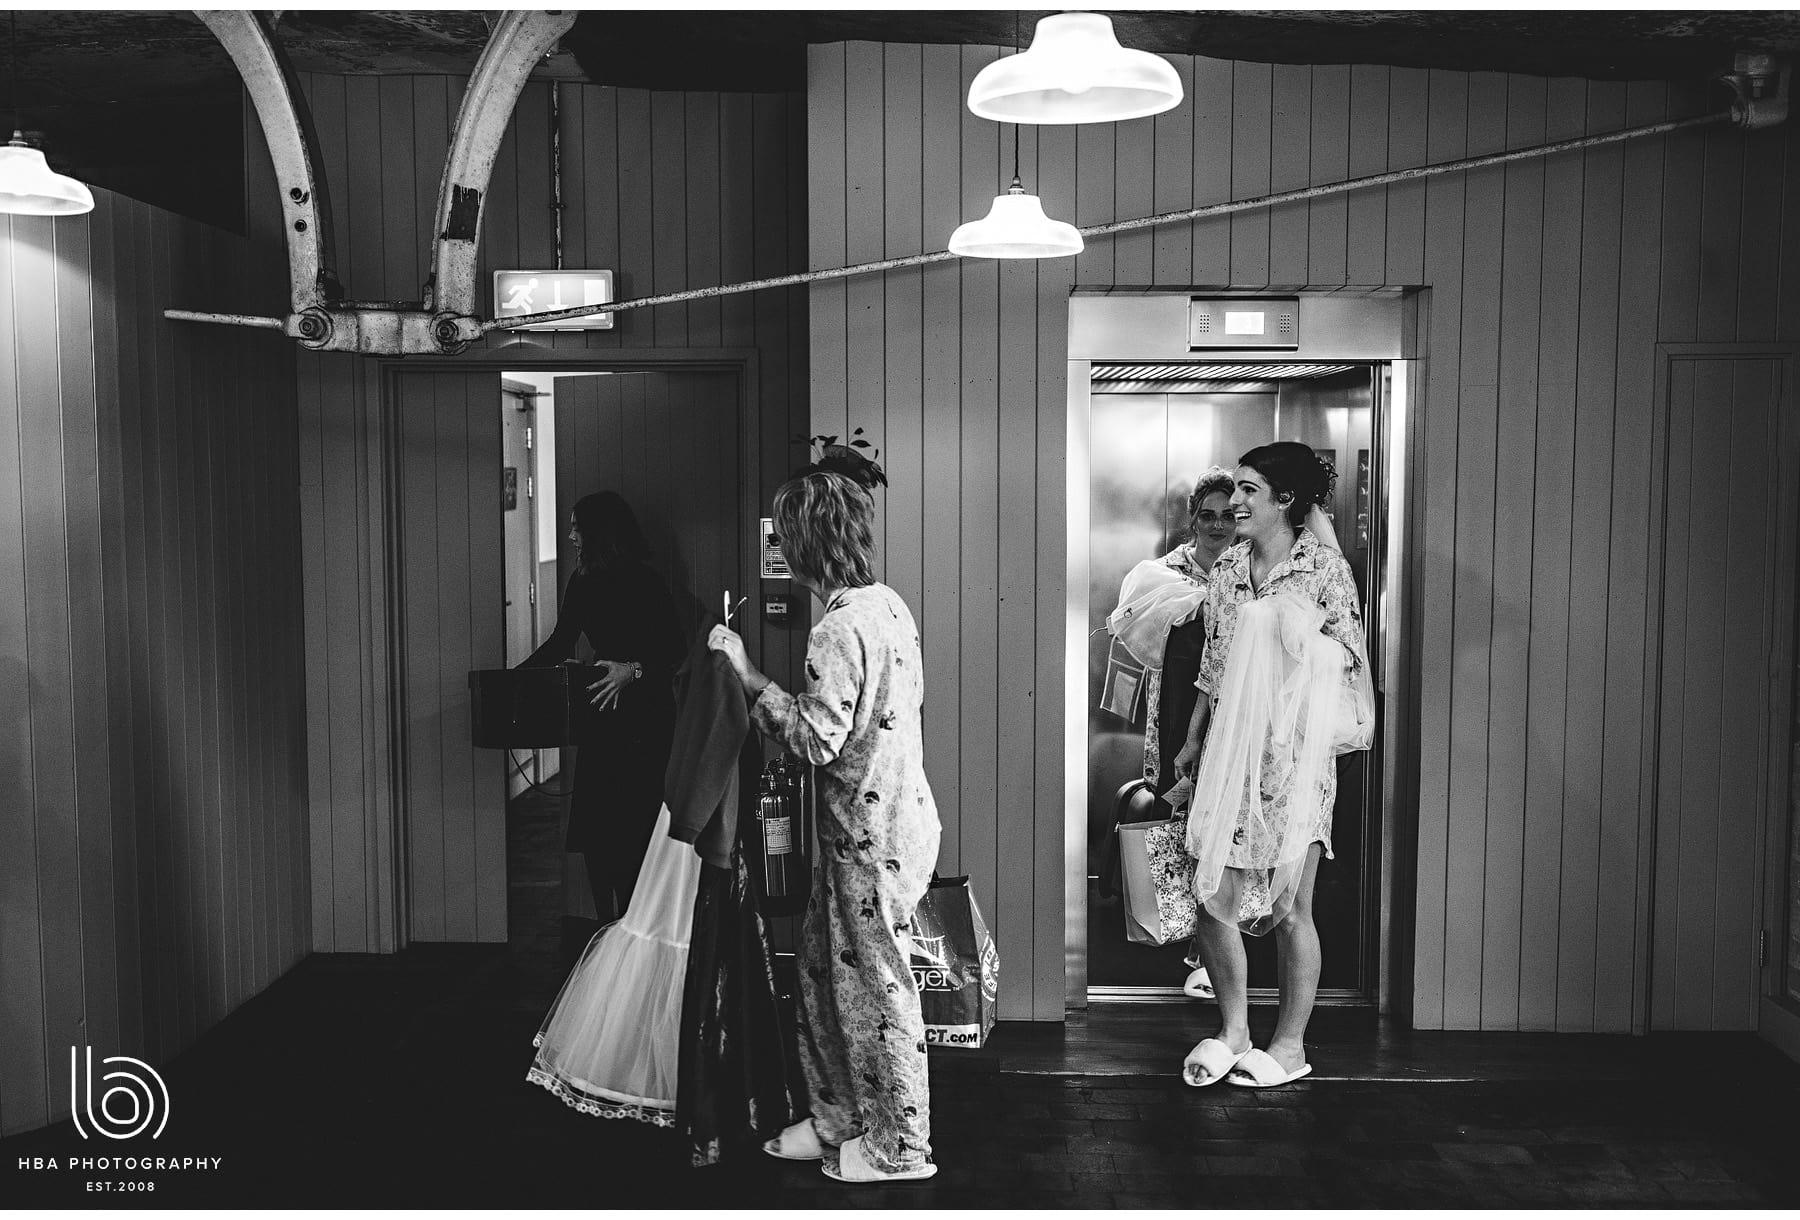 the bride arriving on the top floor